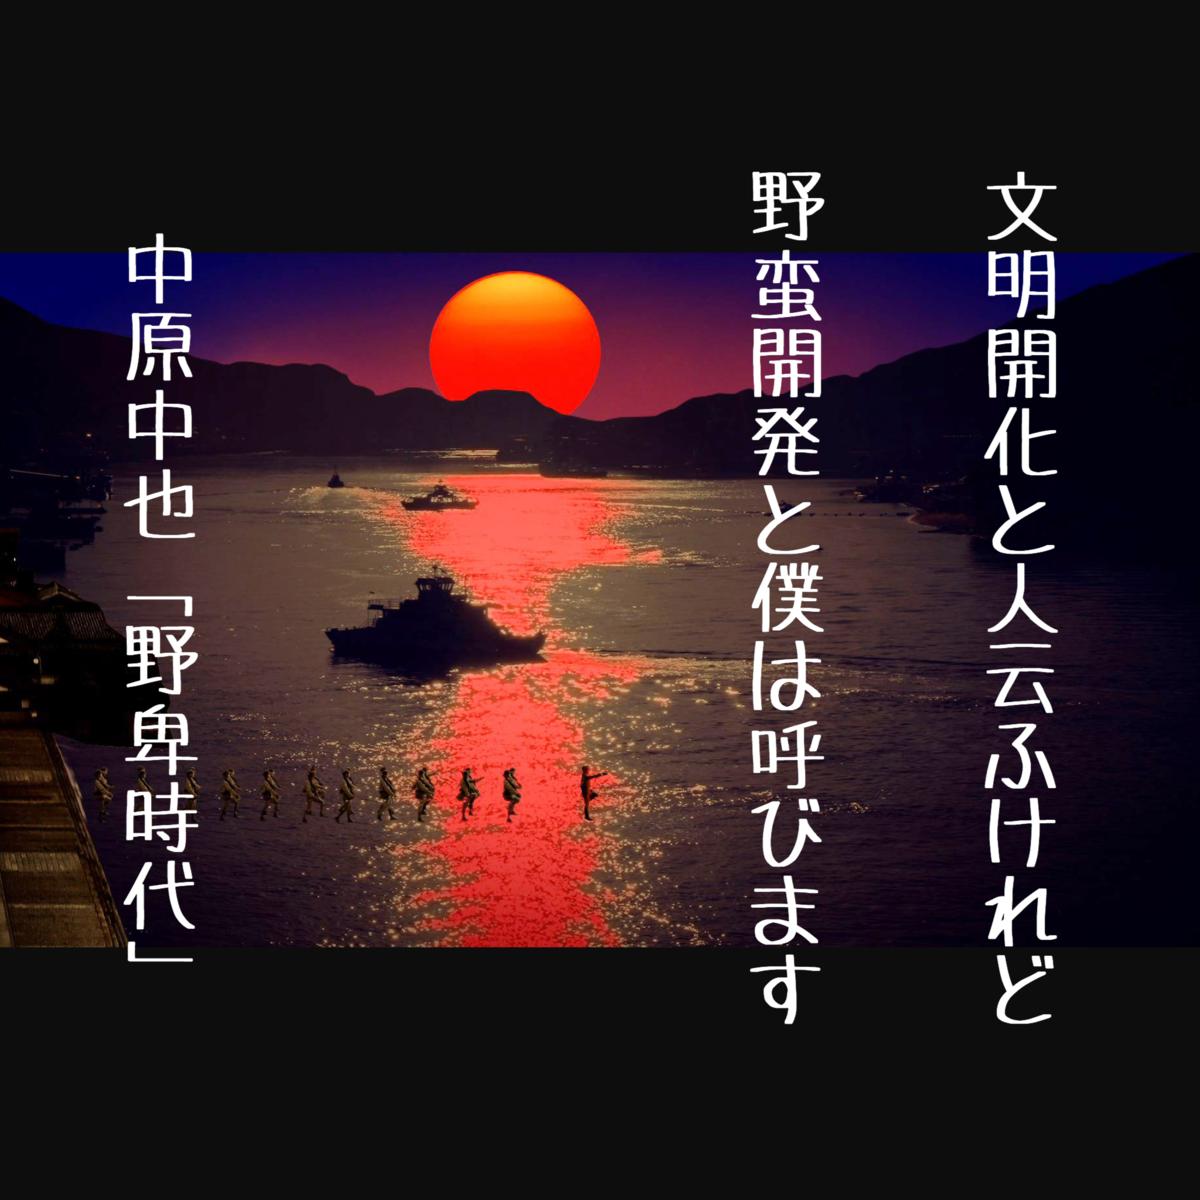 f:id:fuhgetsu:20200806101616p:plain